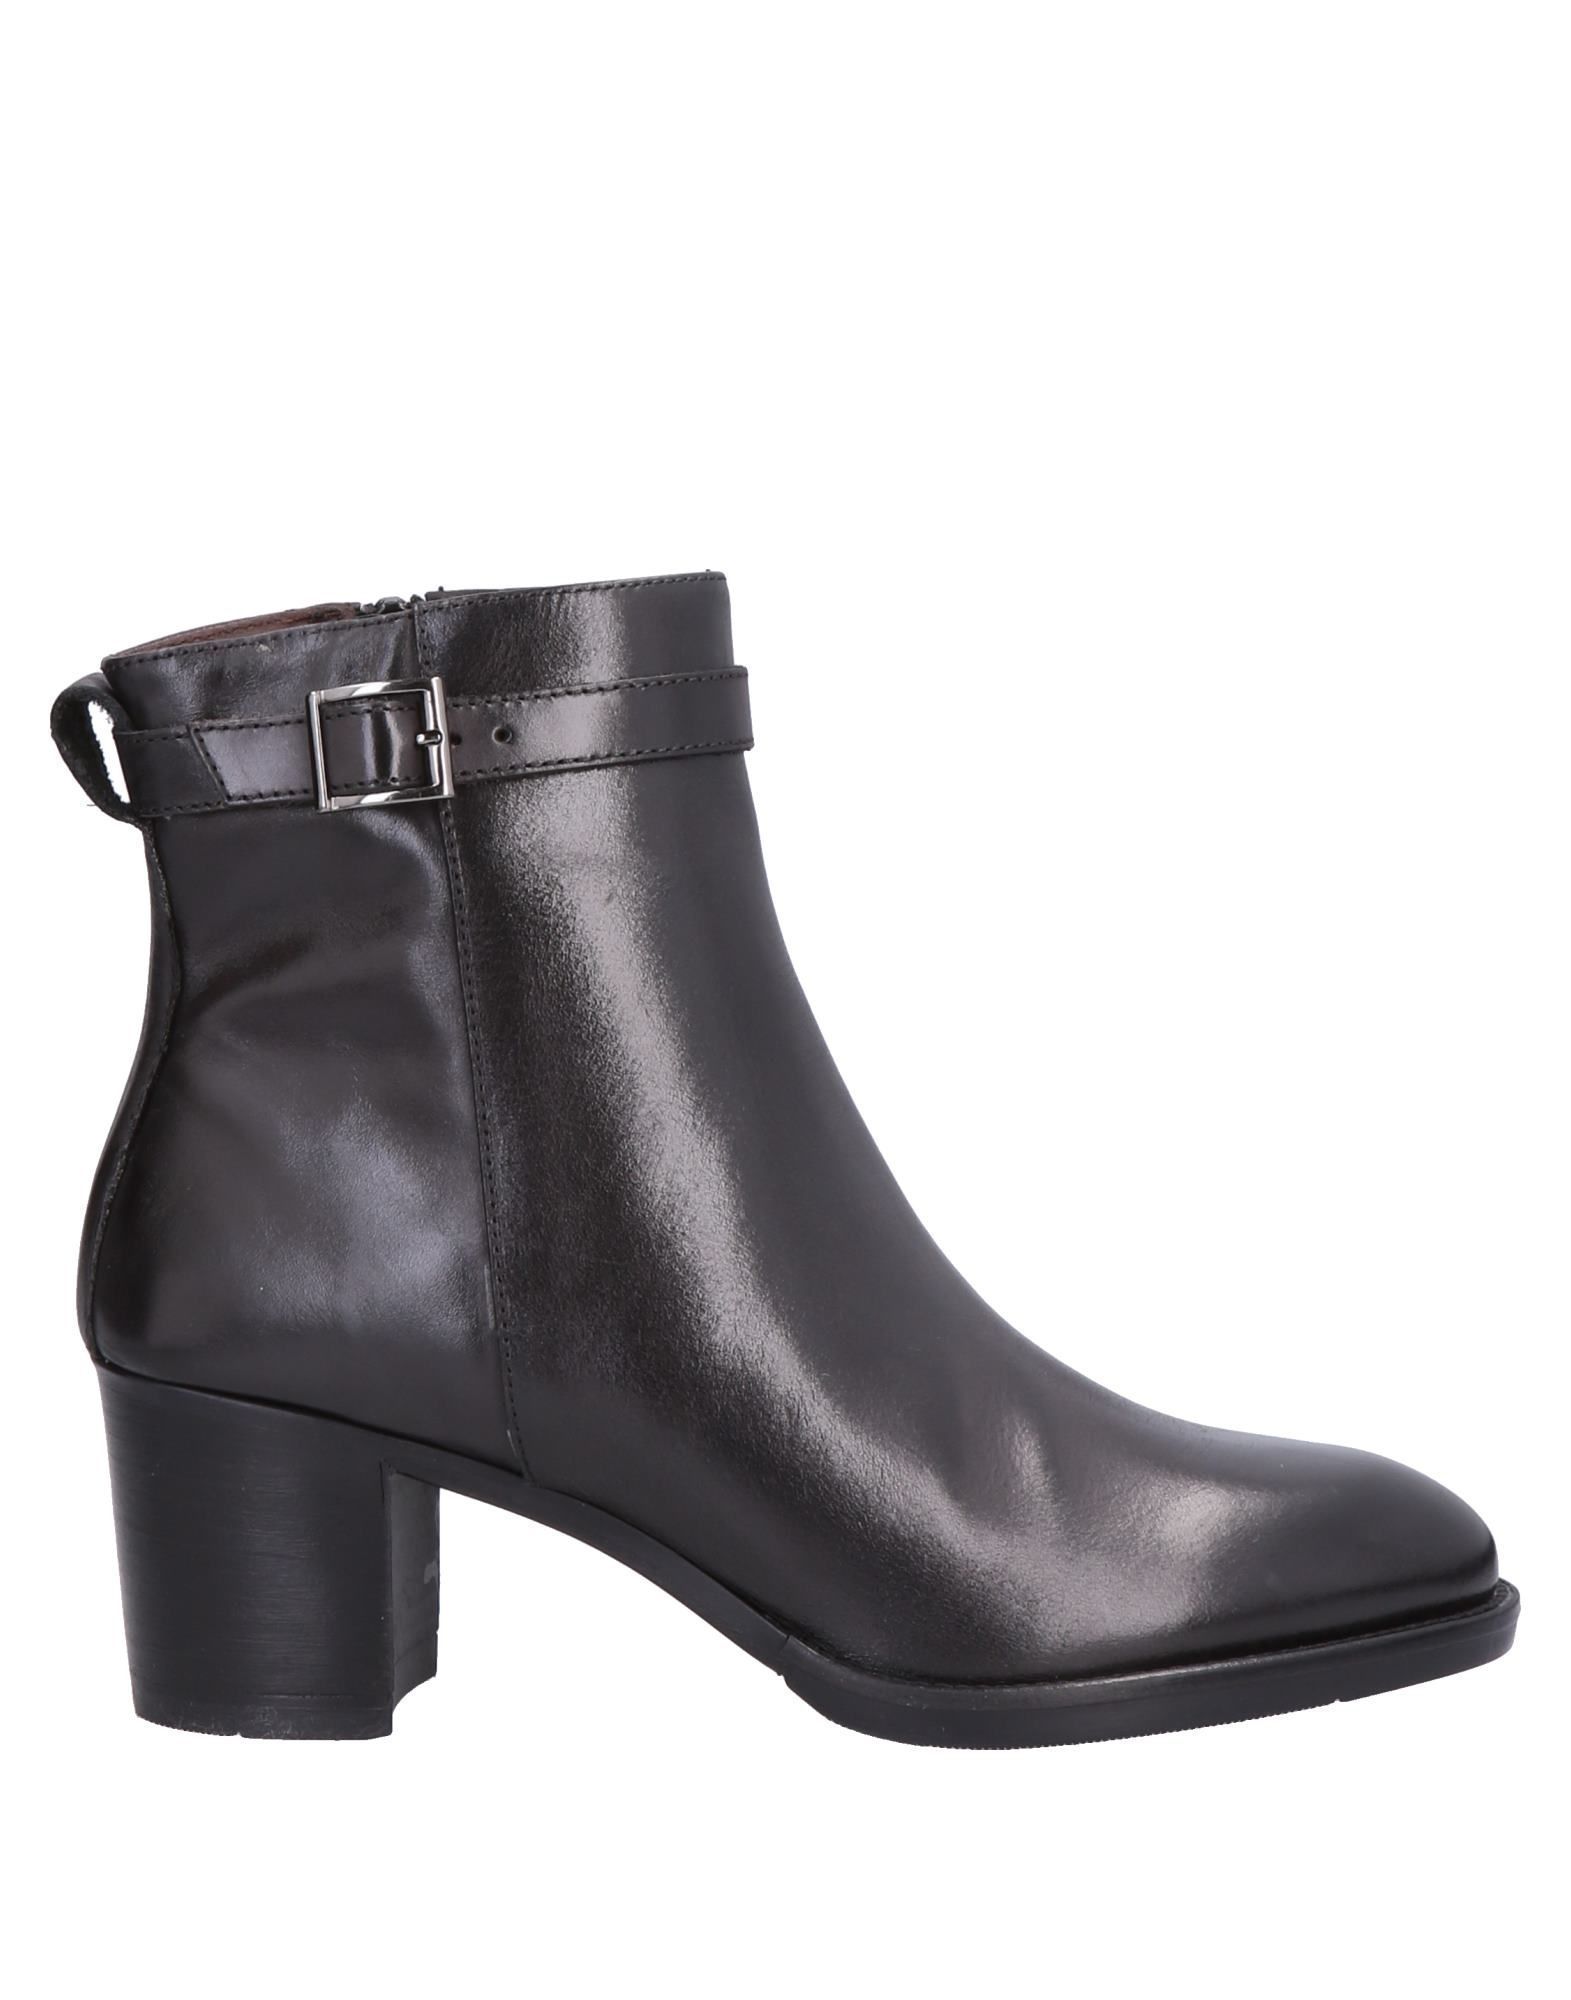 FOOTWEAR Boemos Black Woman Leather